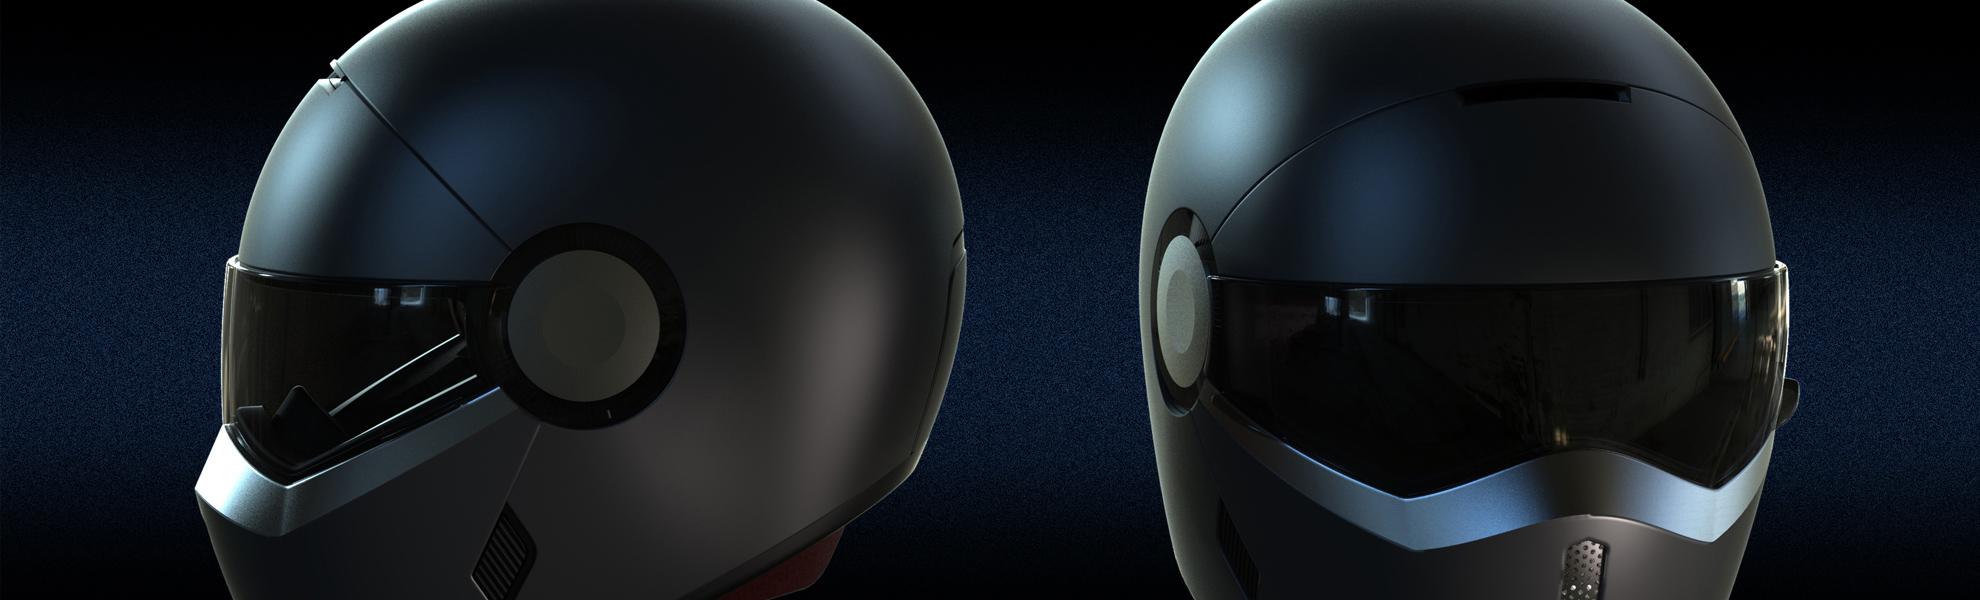 chelles-e-hayashi-design-portfolio-zoe-scage-safe-helmet-structural-product-optimization